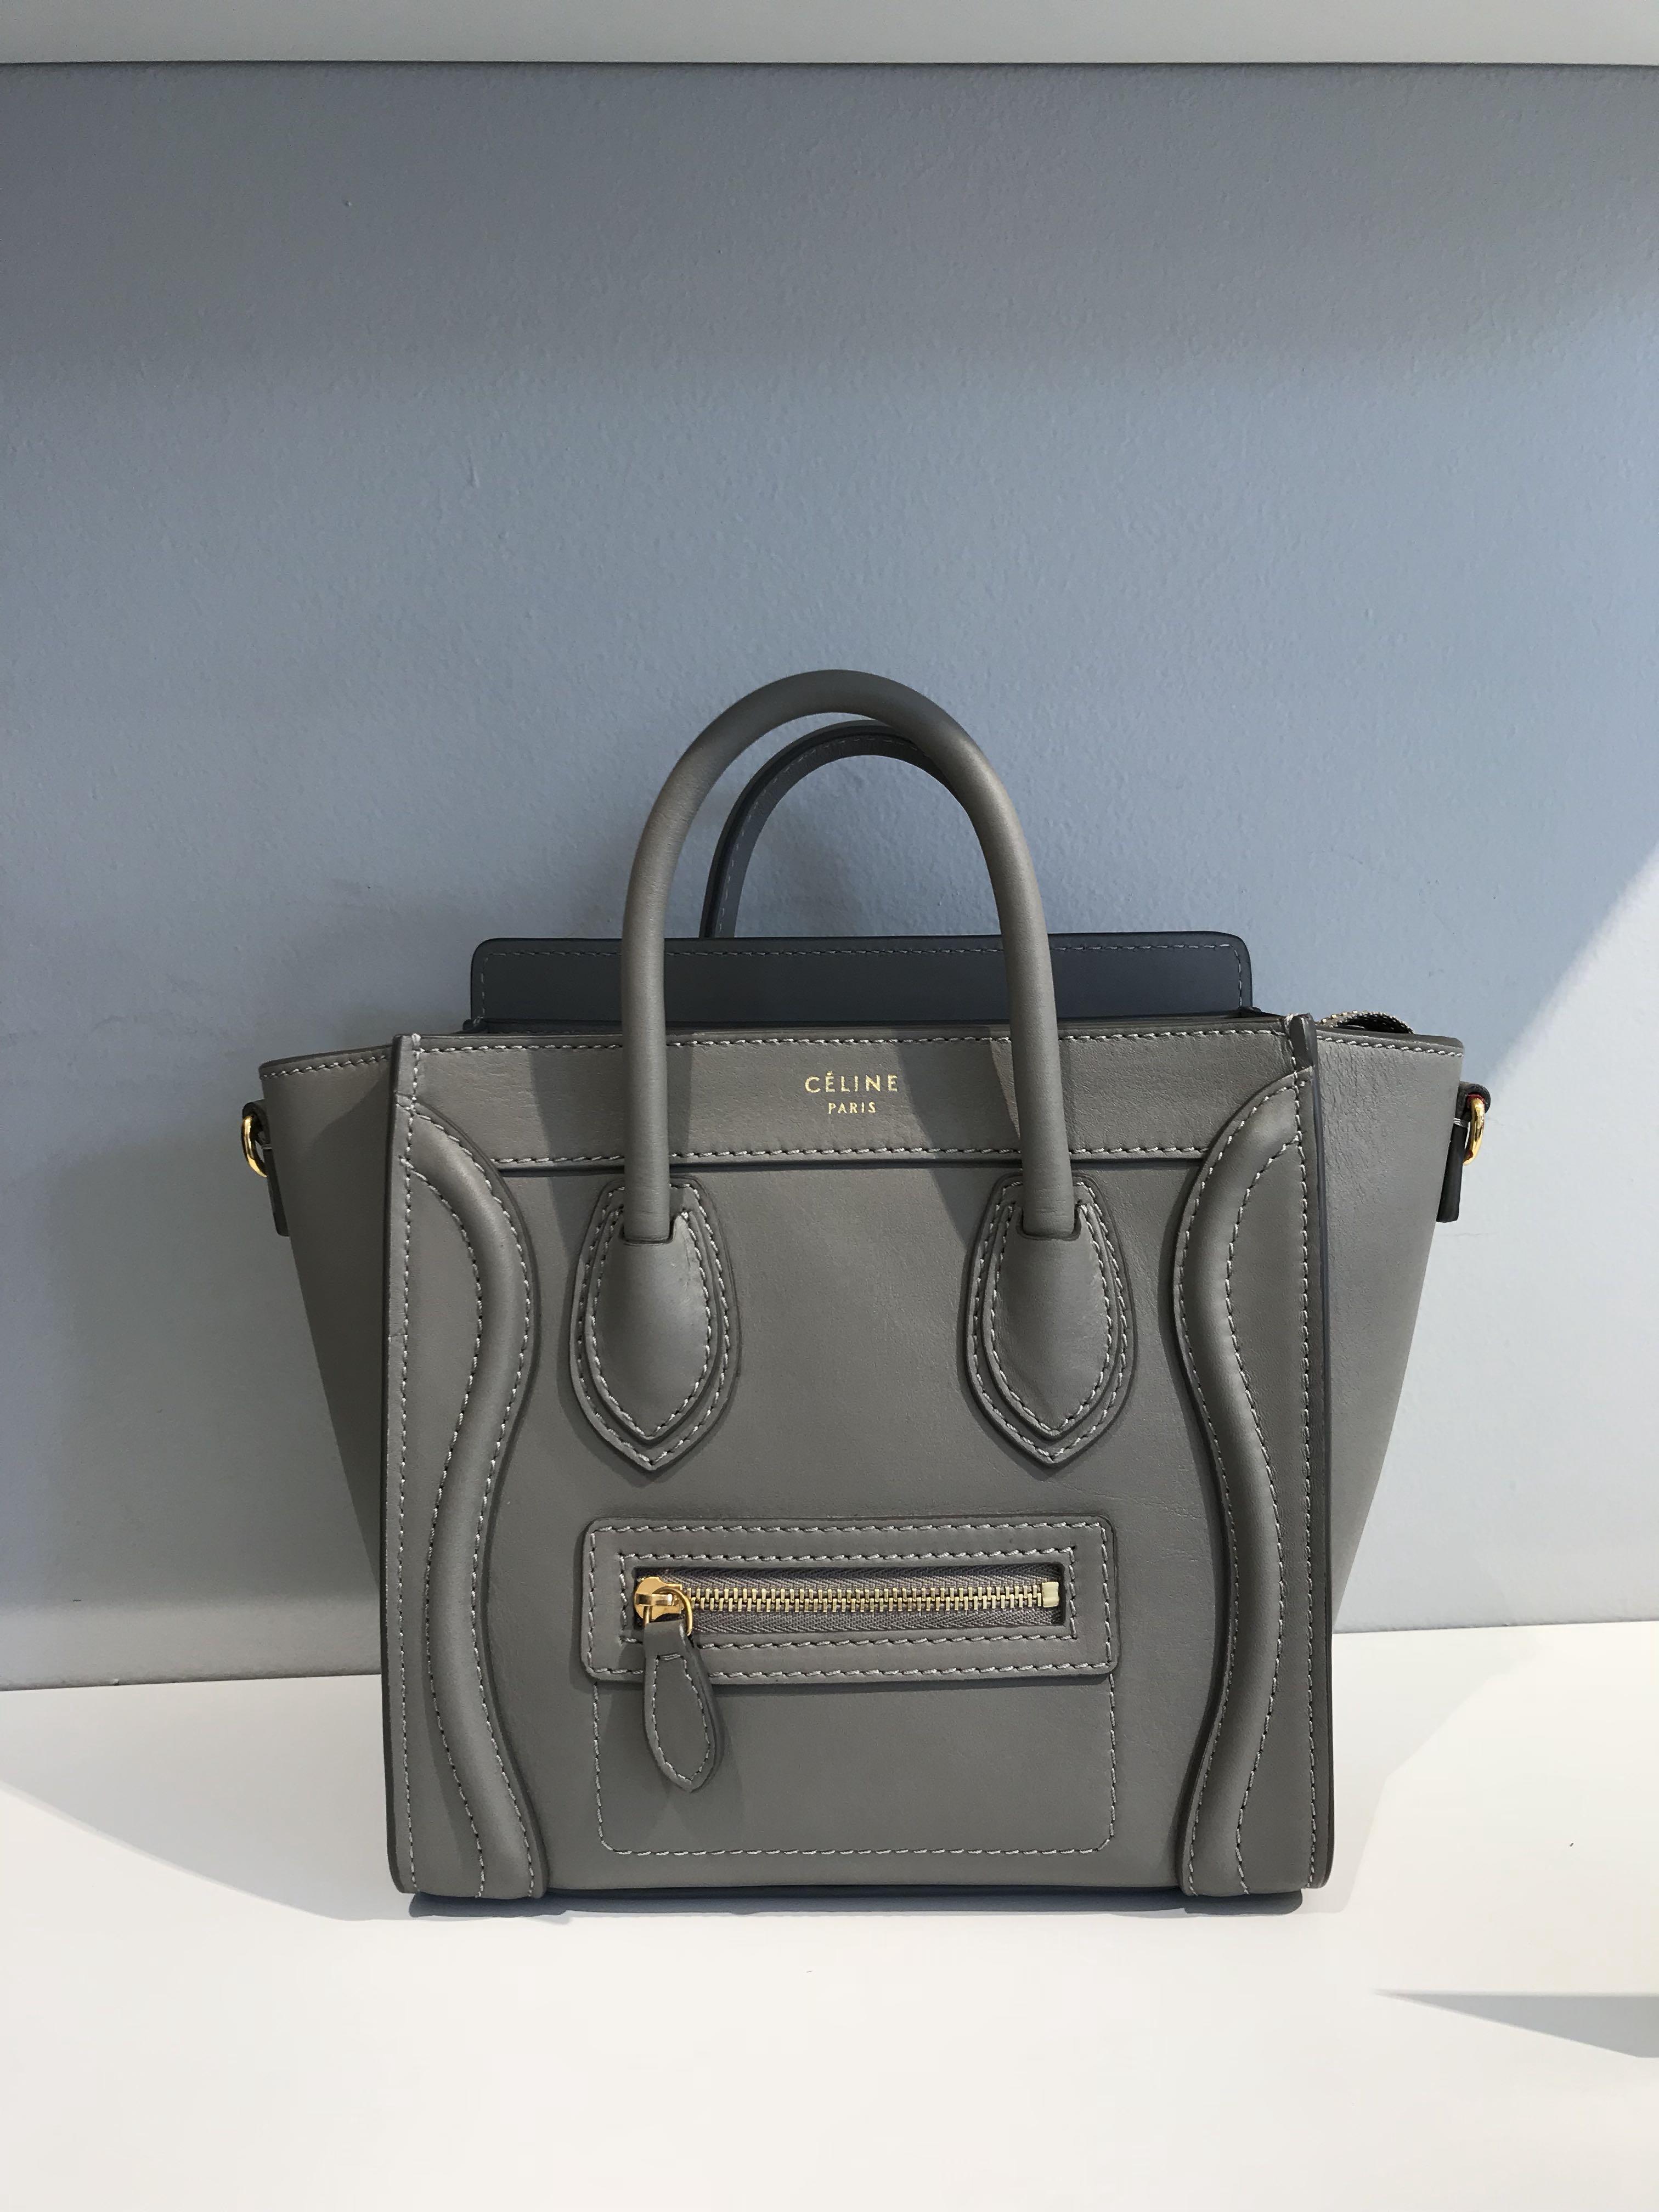 Celine nano lugage Smooth leather grey